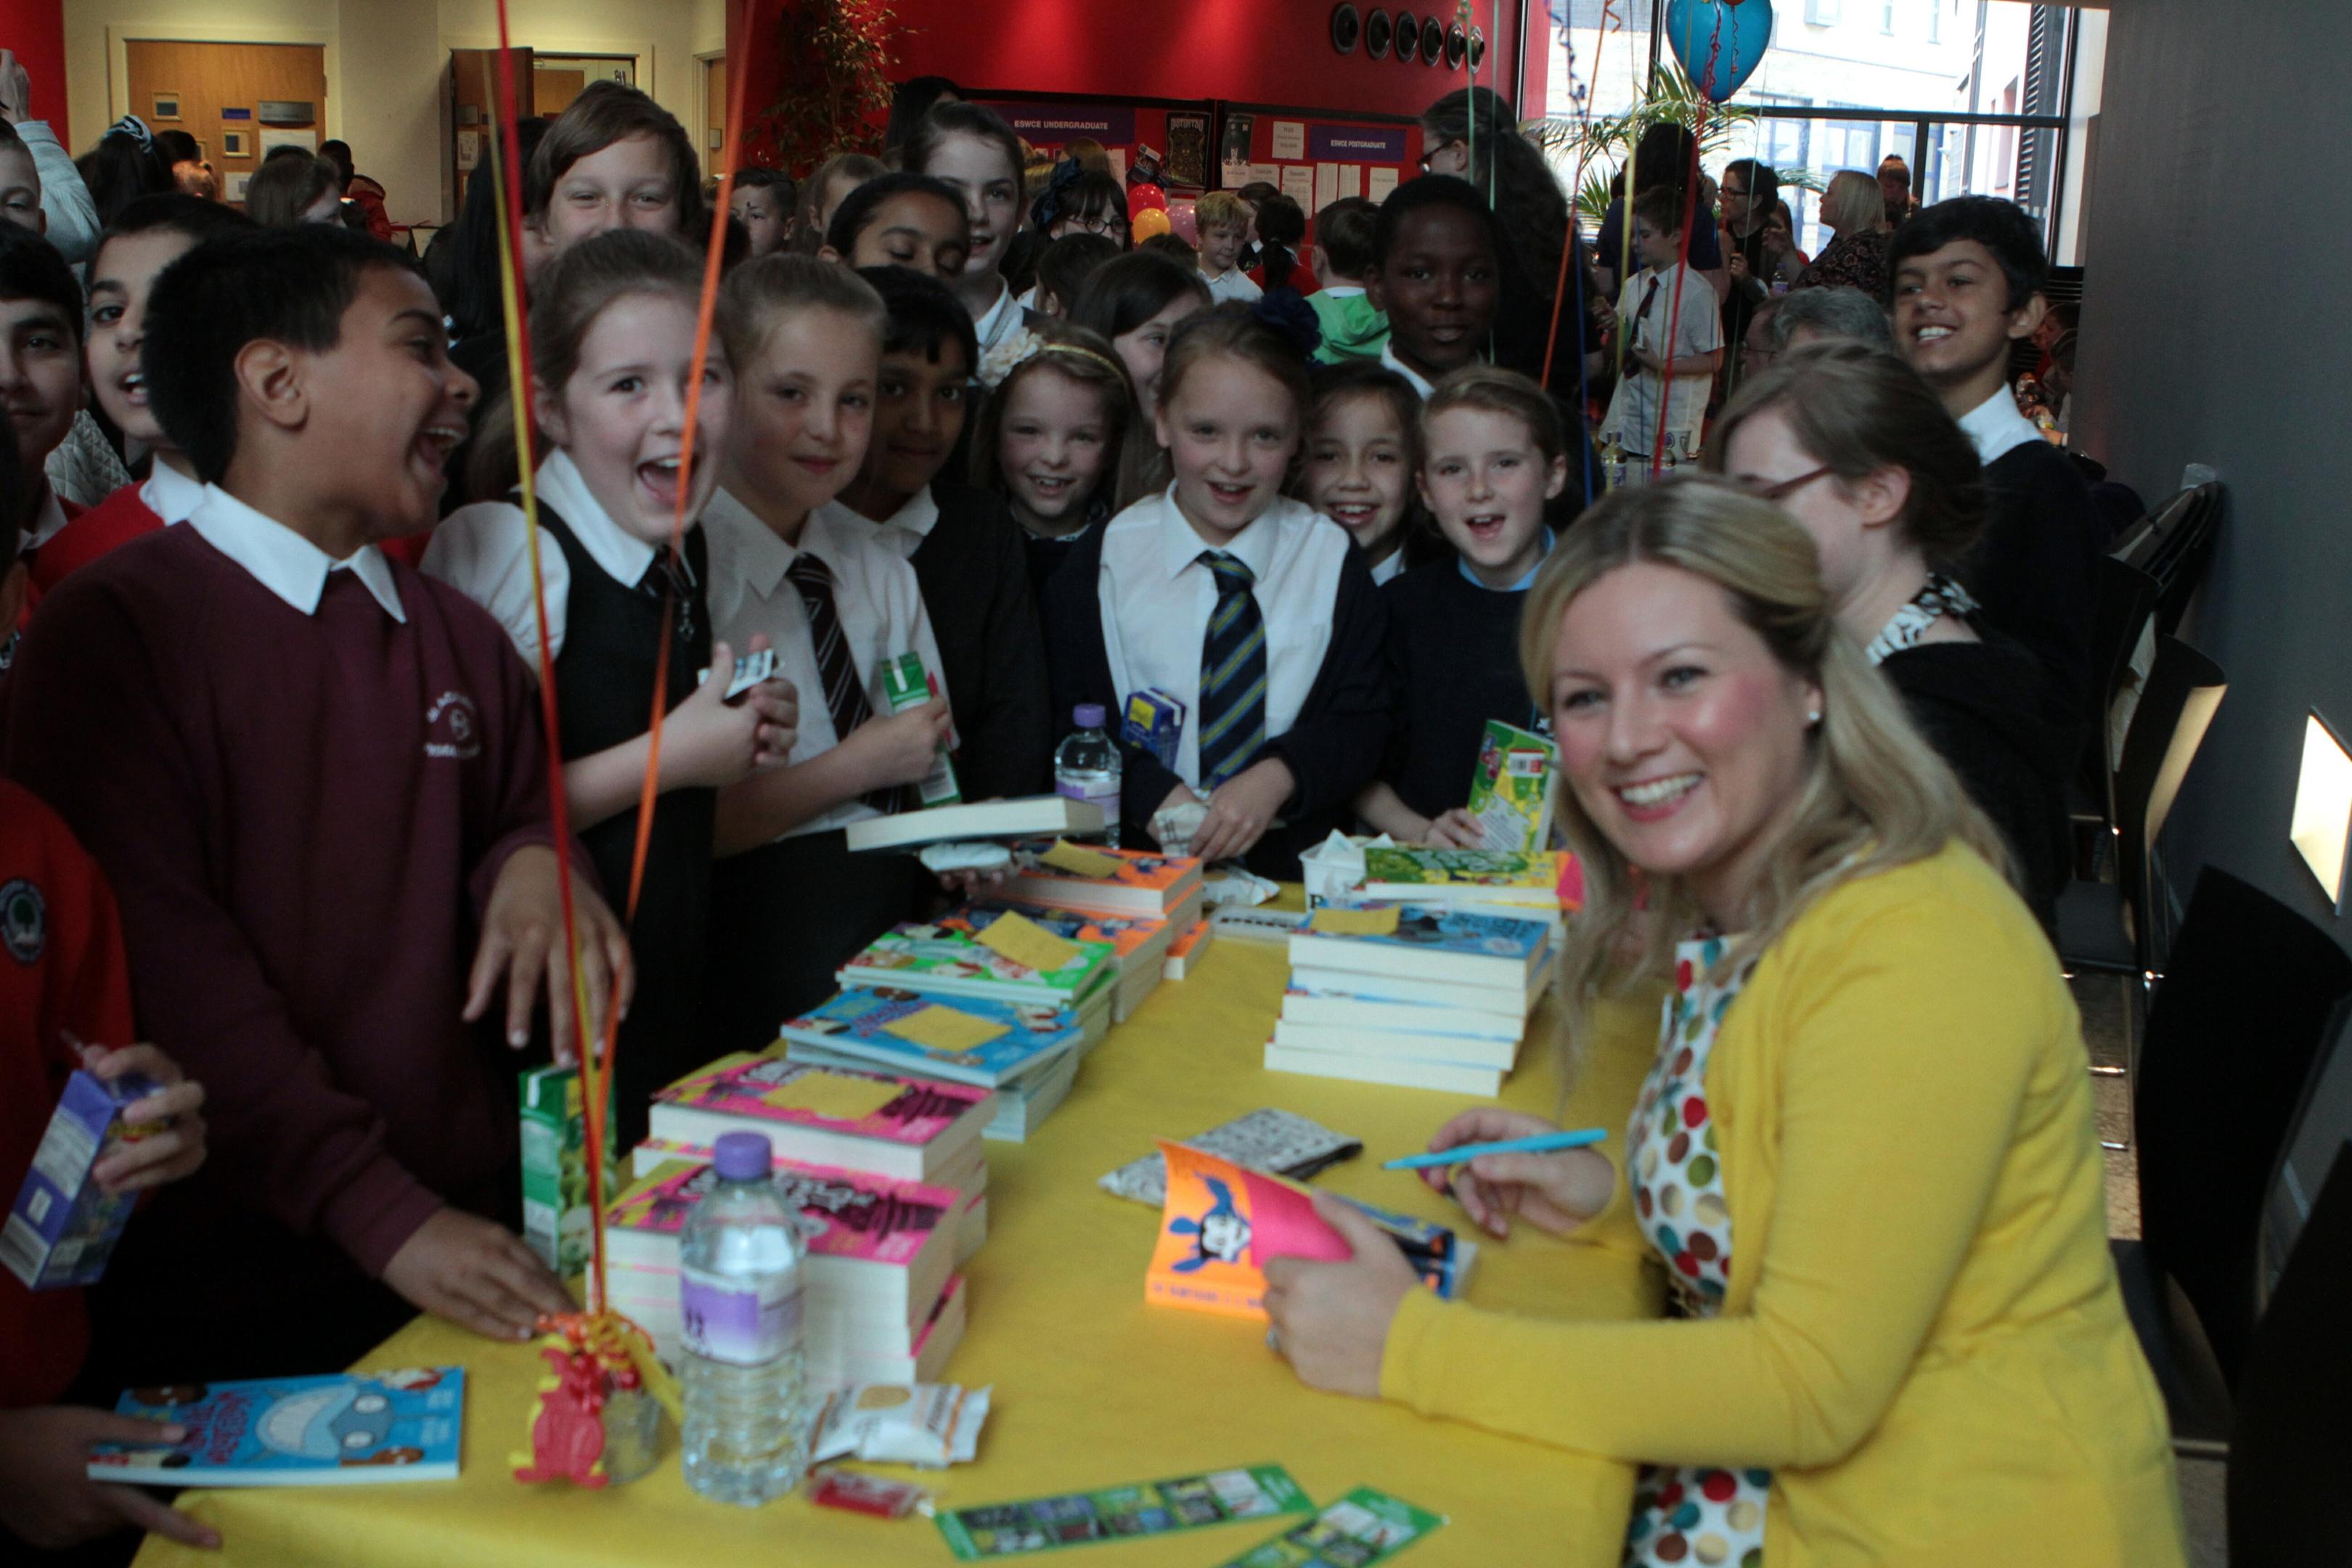 Pamela Butchart at the Dundee Area Children's Book Week